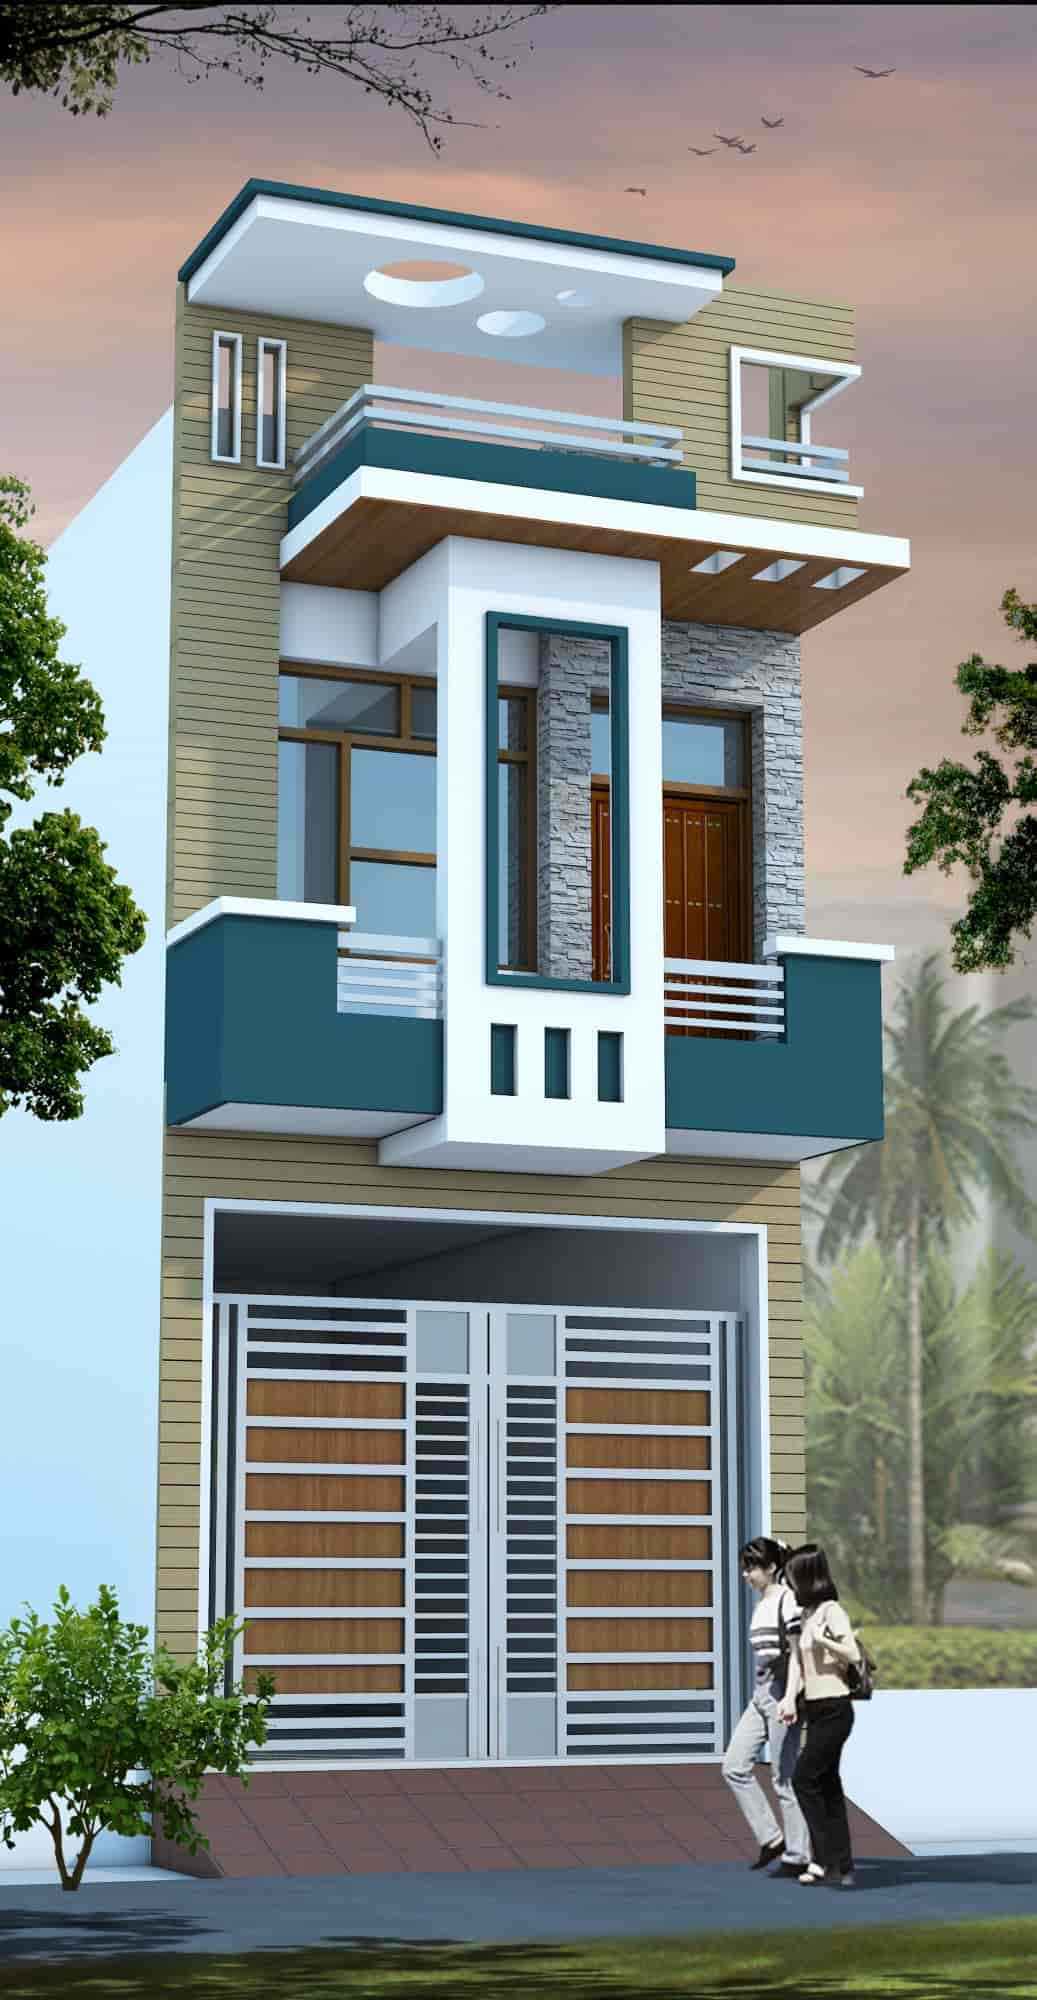 Home Designs Ociates Muzaffar Nagar City Exterior Designers In Muzaffarnagar Justdial